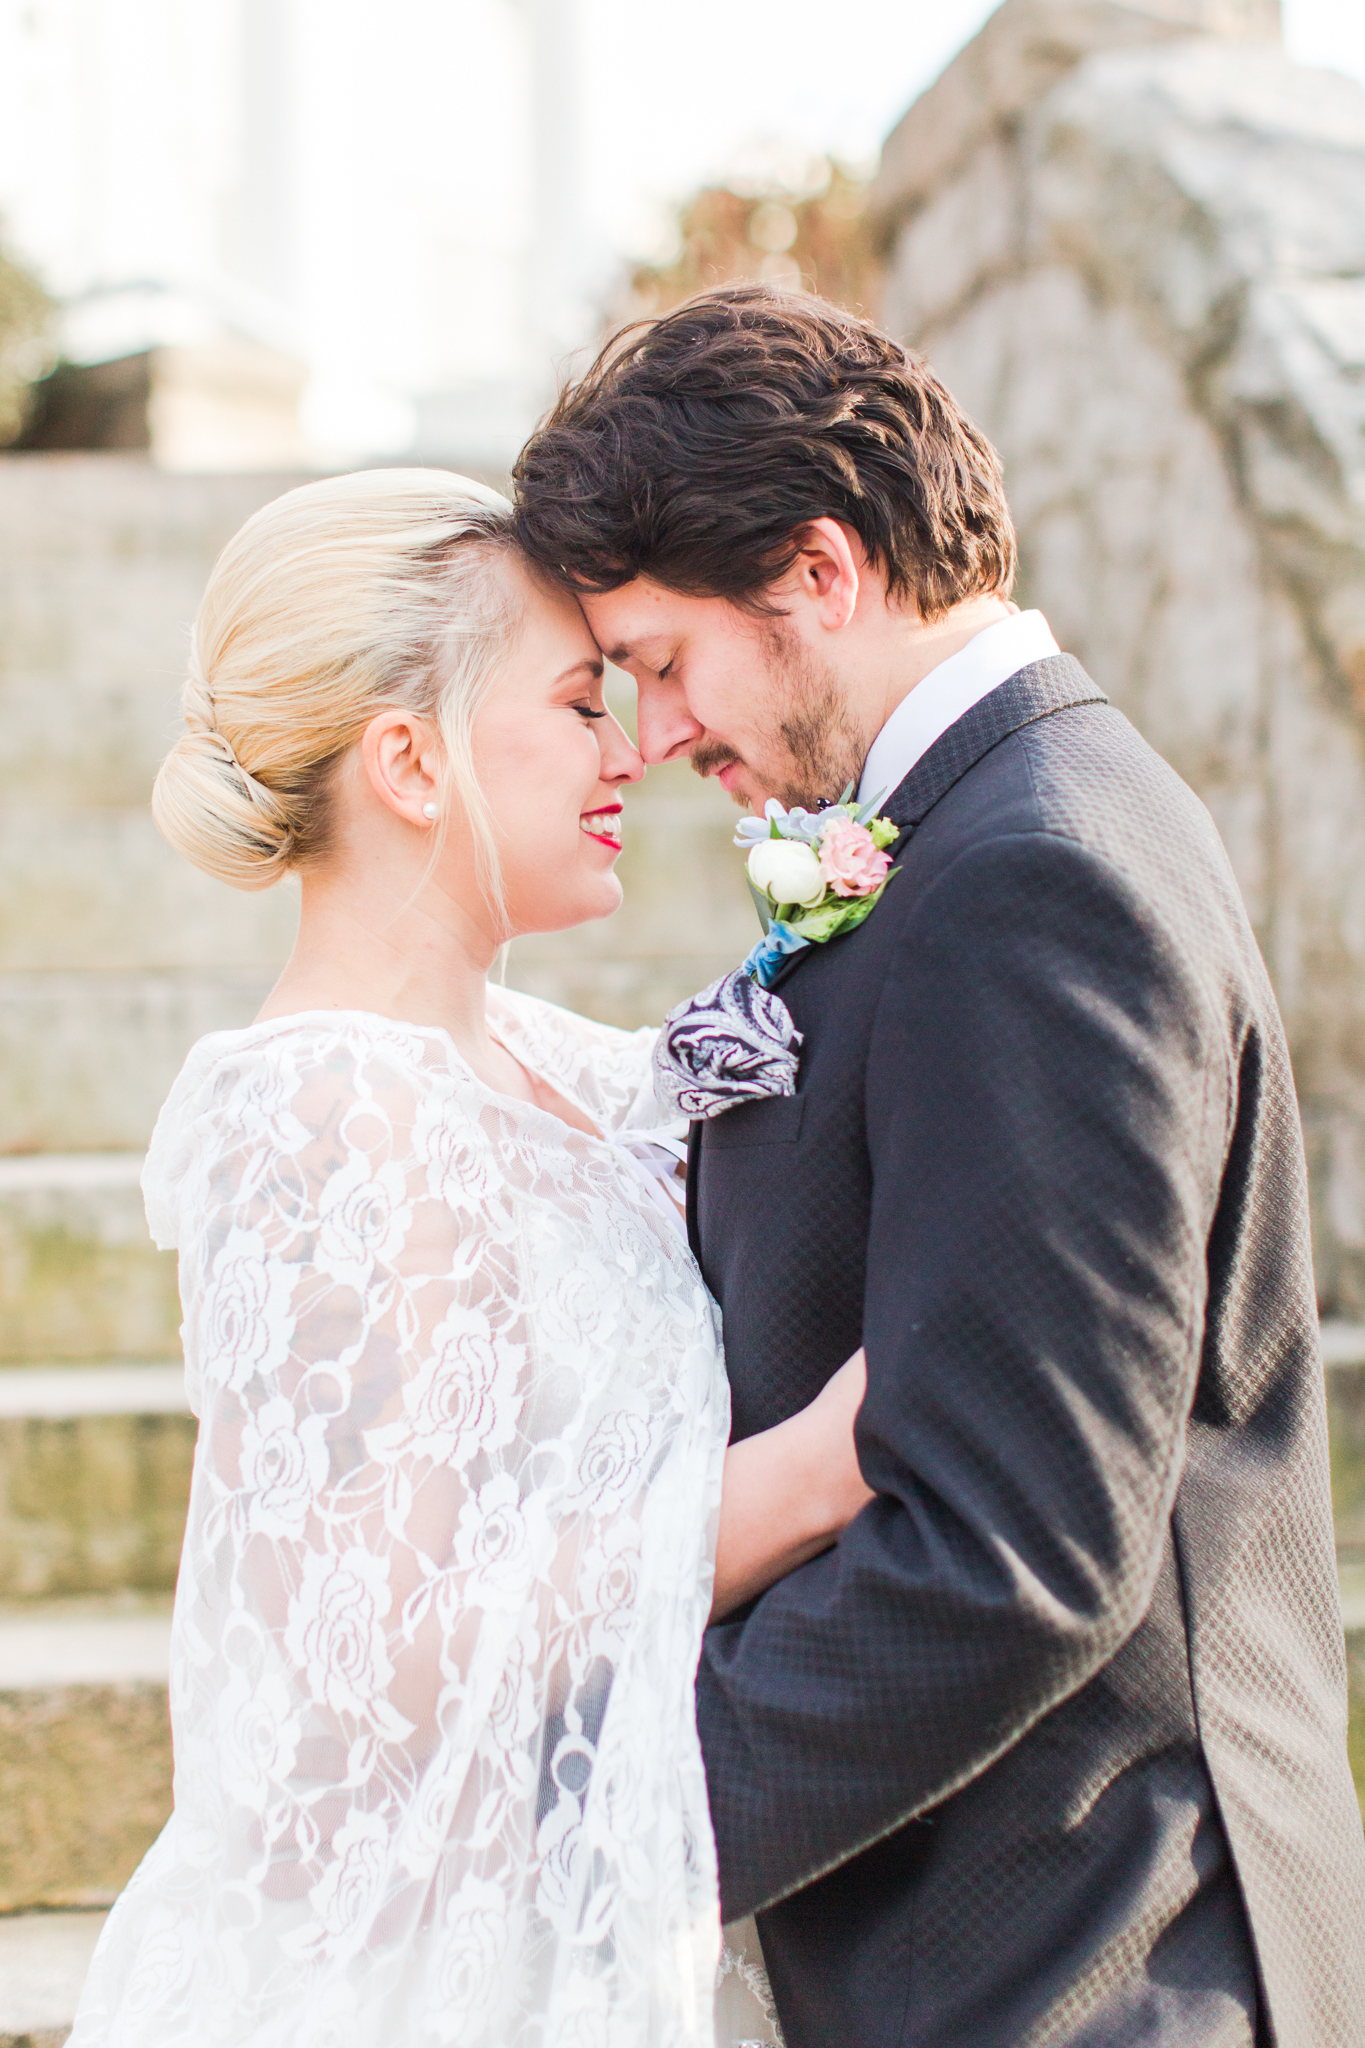 Haley Mansion Winter Wedding - Shaina Lee Photography-303.jpg